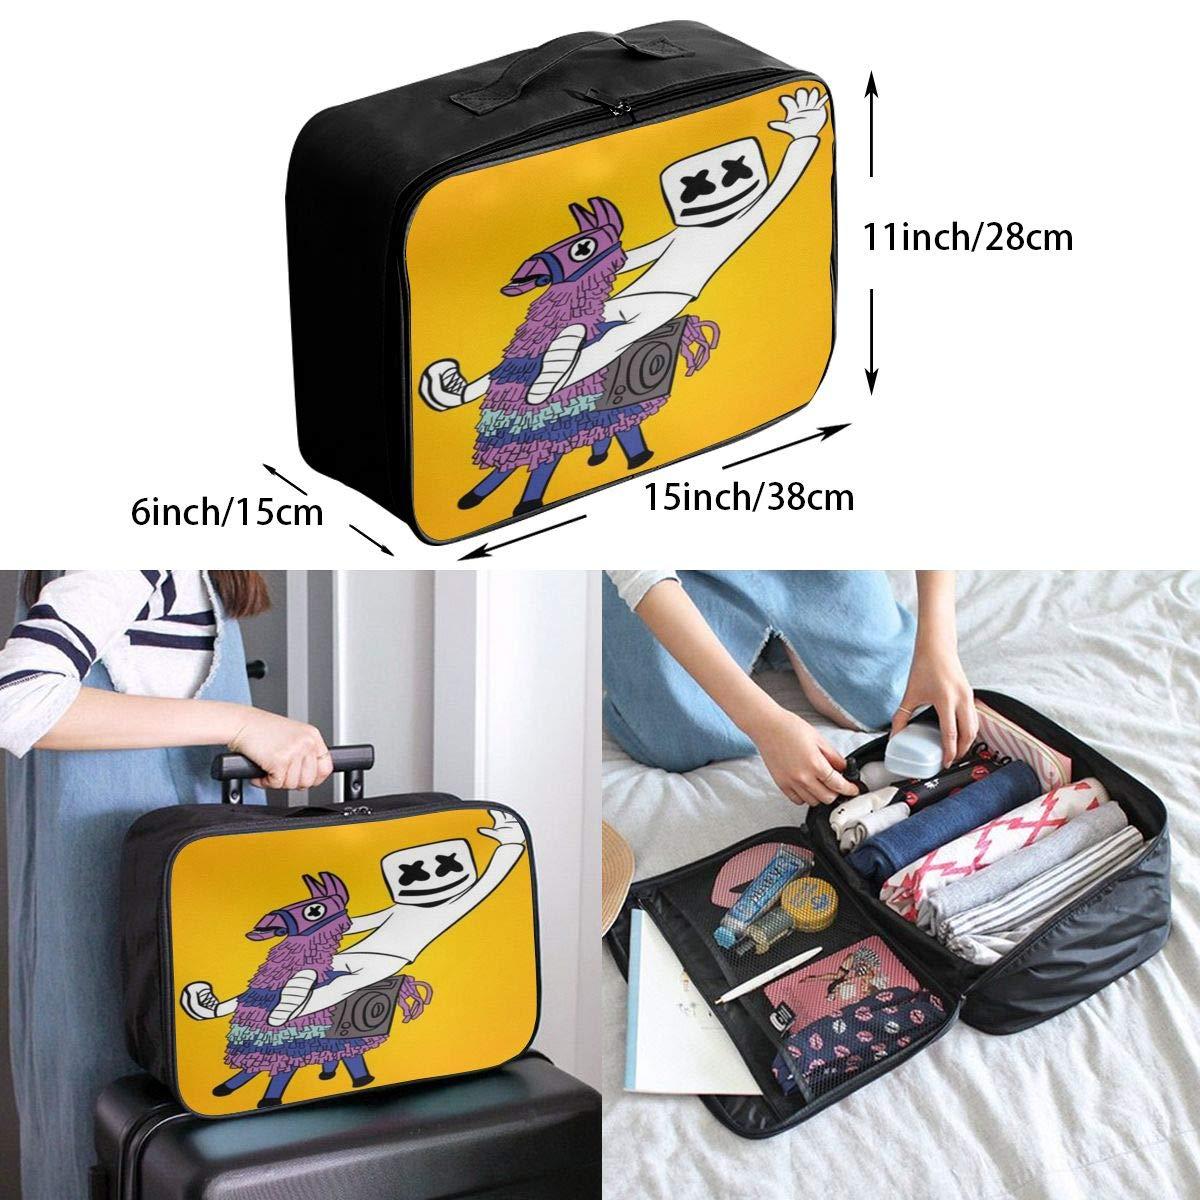 Mar/_sh/_me/_llo Large Capacity Portable Luggage Bag Travel Lightweight Waterproof Storage Carry Luggage Duffel Tote Bag